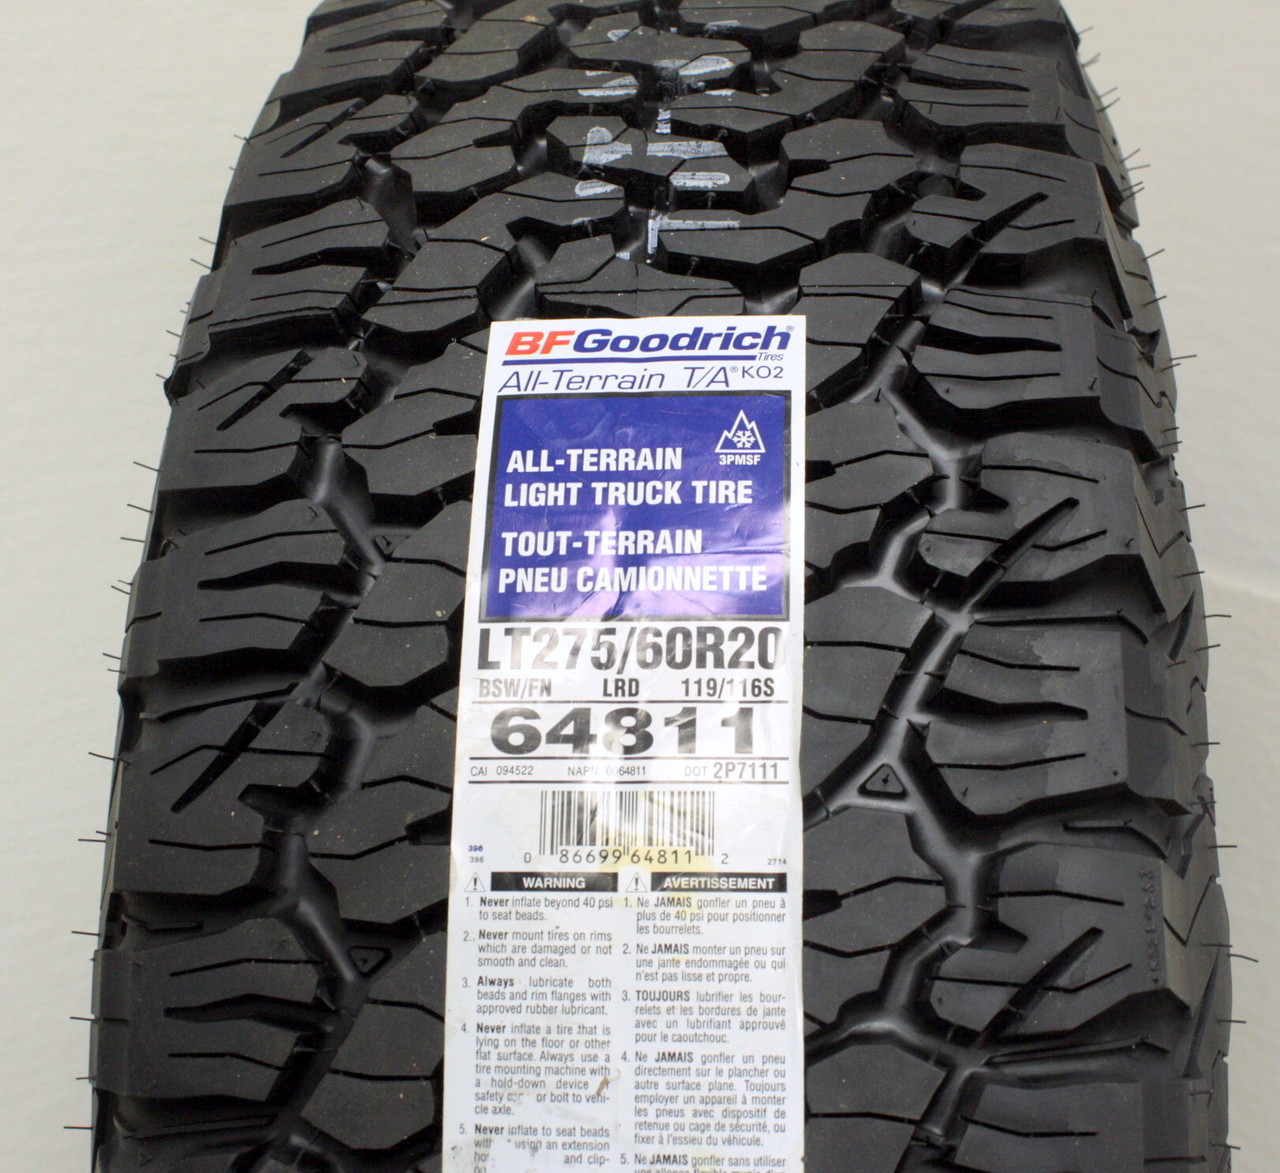 "Chrome 20"" Eight Spoke Wheels with BFG KO2 A/T Tires for Chevy Silverado, Tahoe, Suburban - New Set of 4"